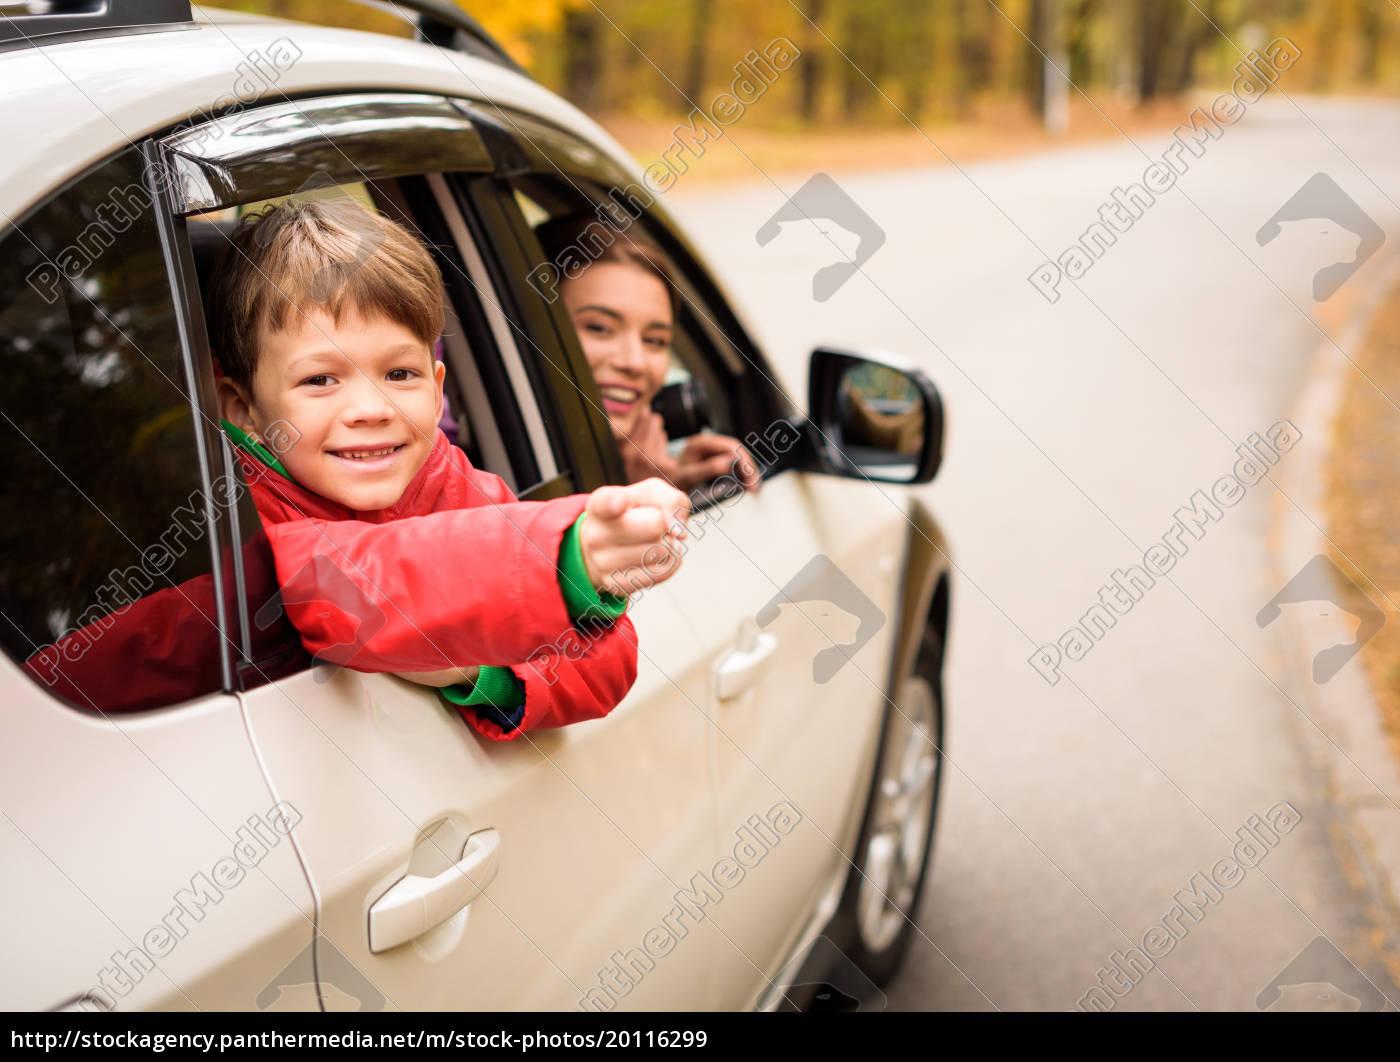 smiling, boy, looking, through, car, window - 20116299